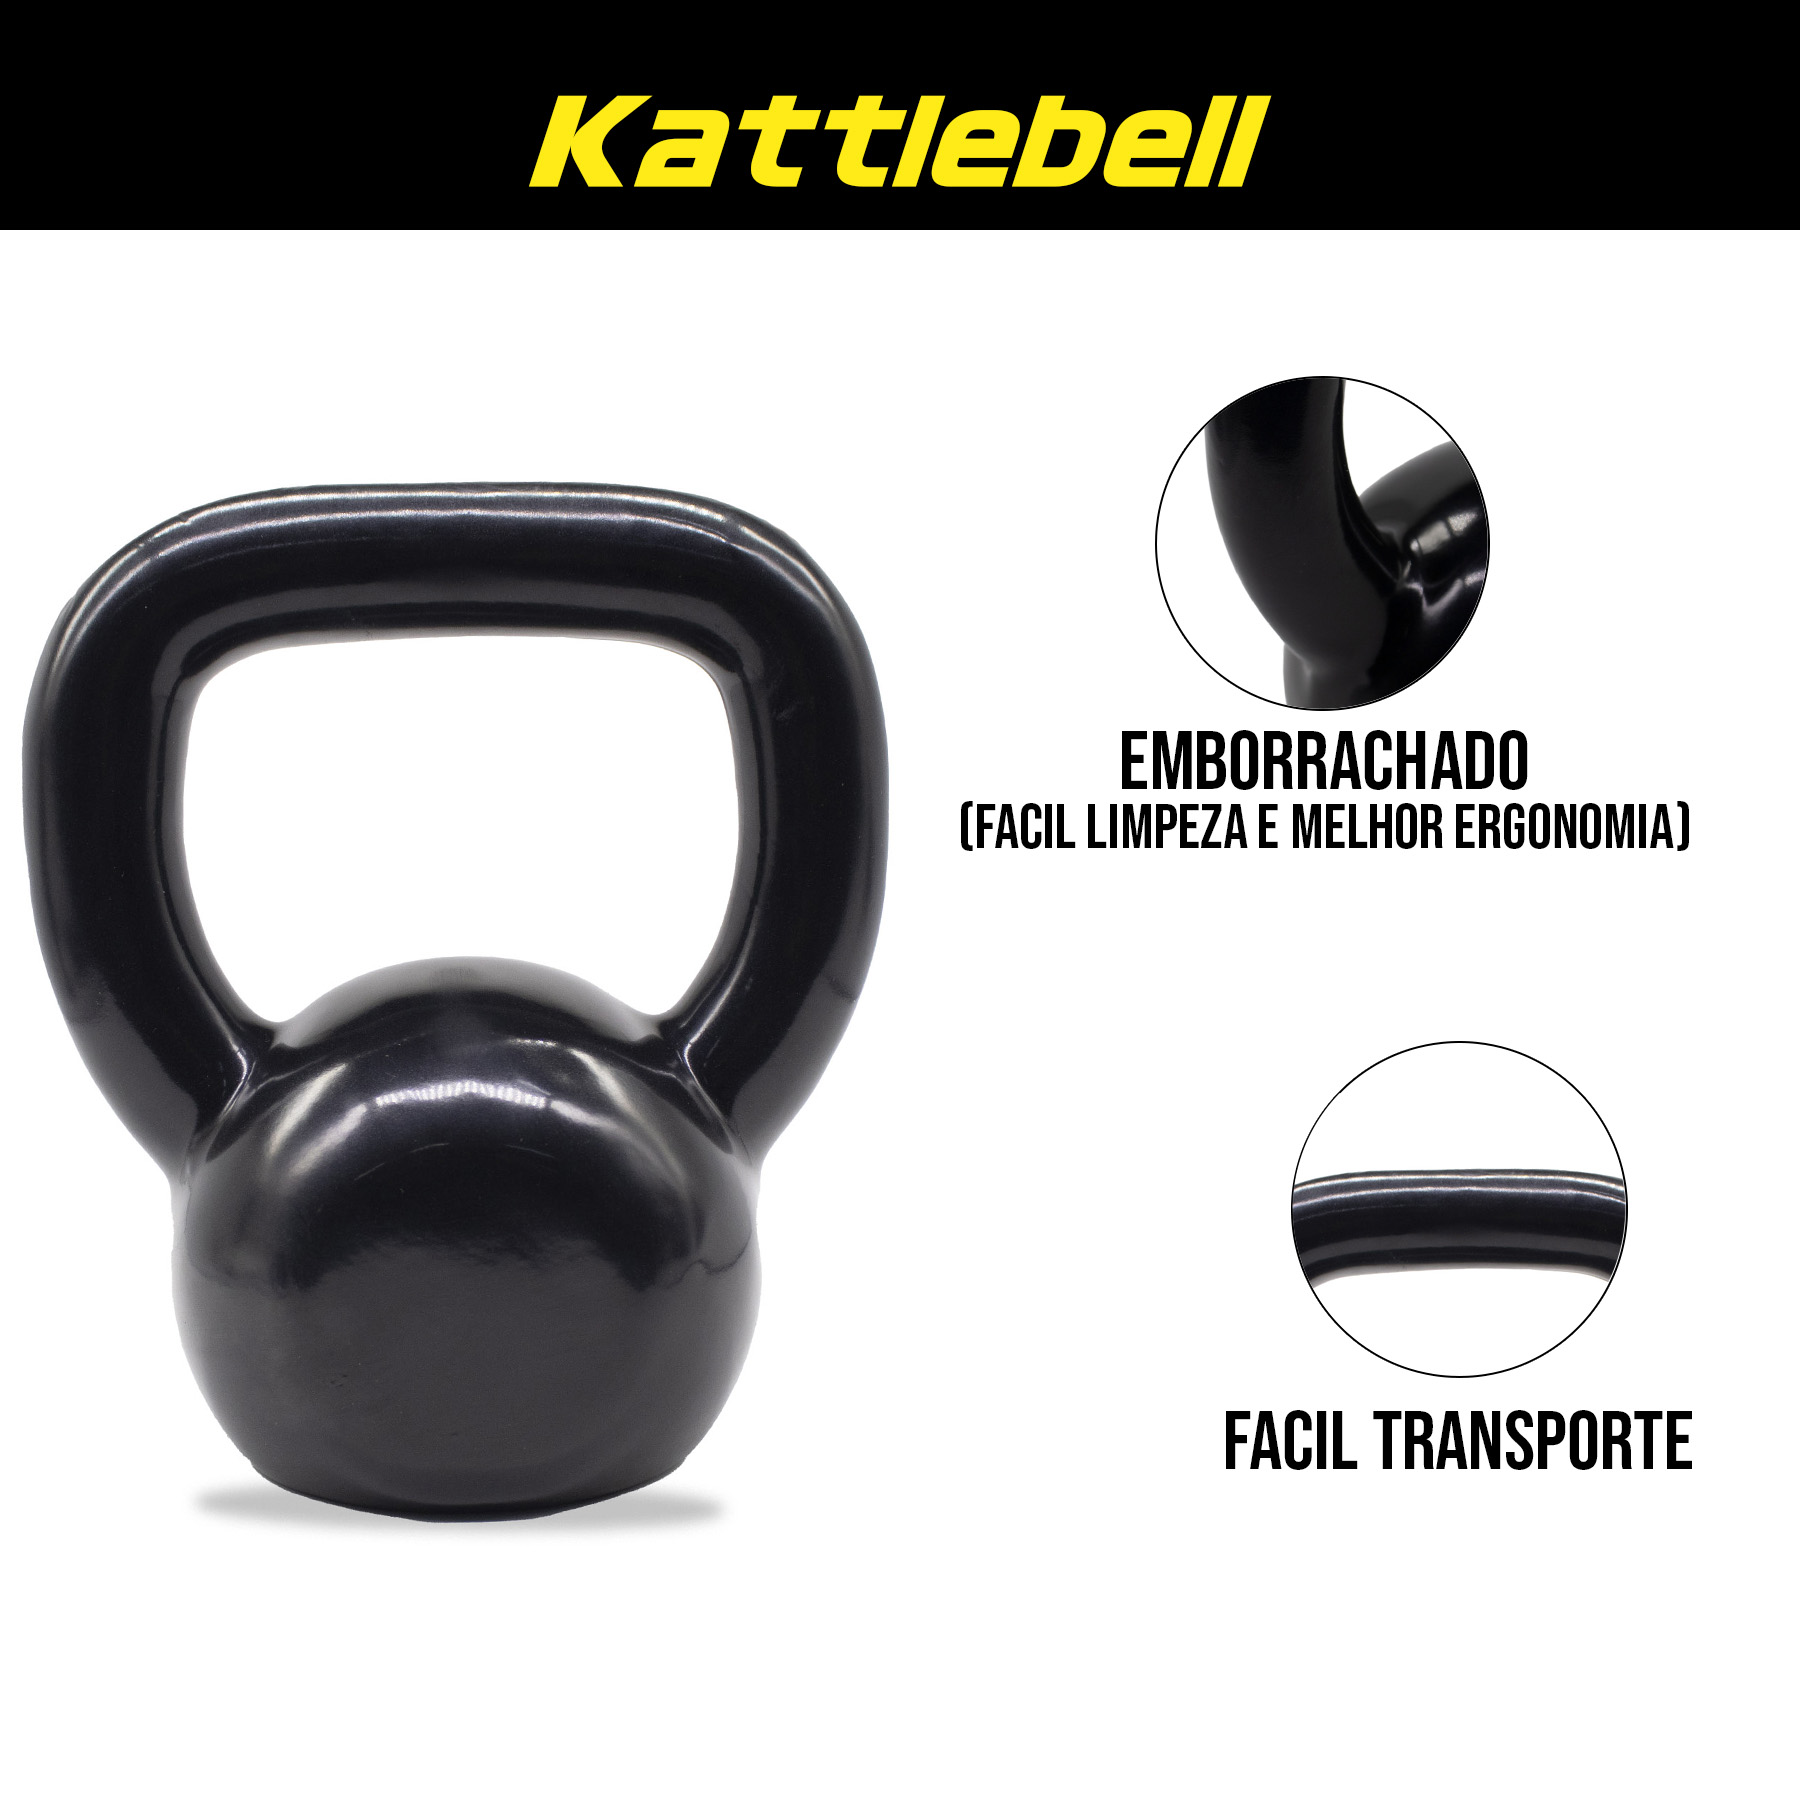 Kettlebell Emborrachado Peso:16KG